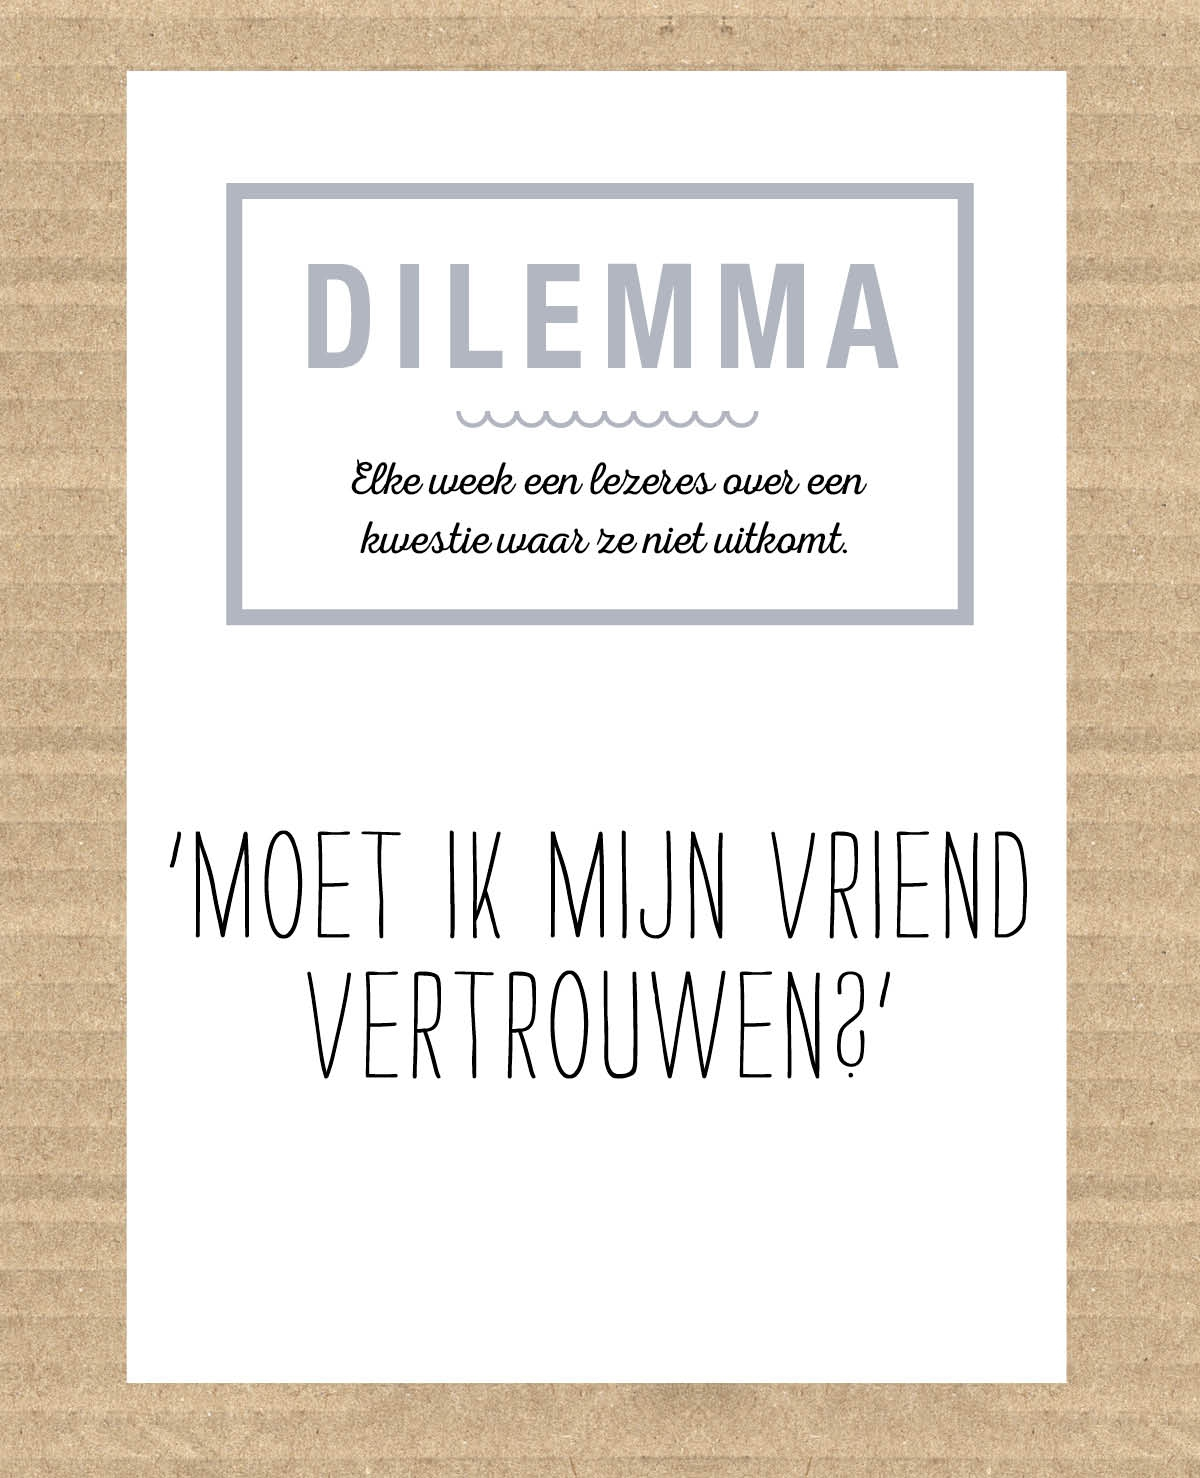 Dilemma: 'Moet ik mijn partner vertrouwen?'